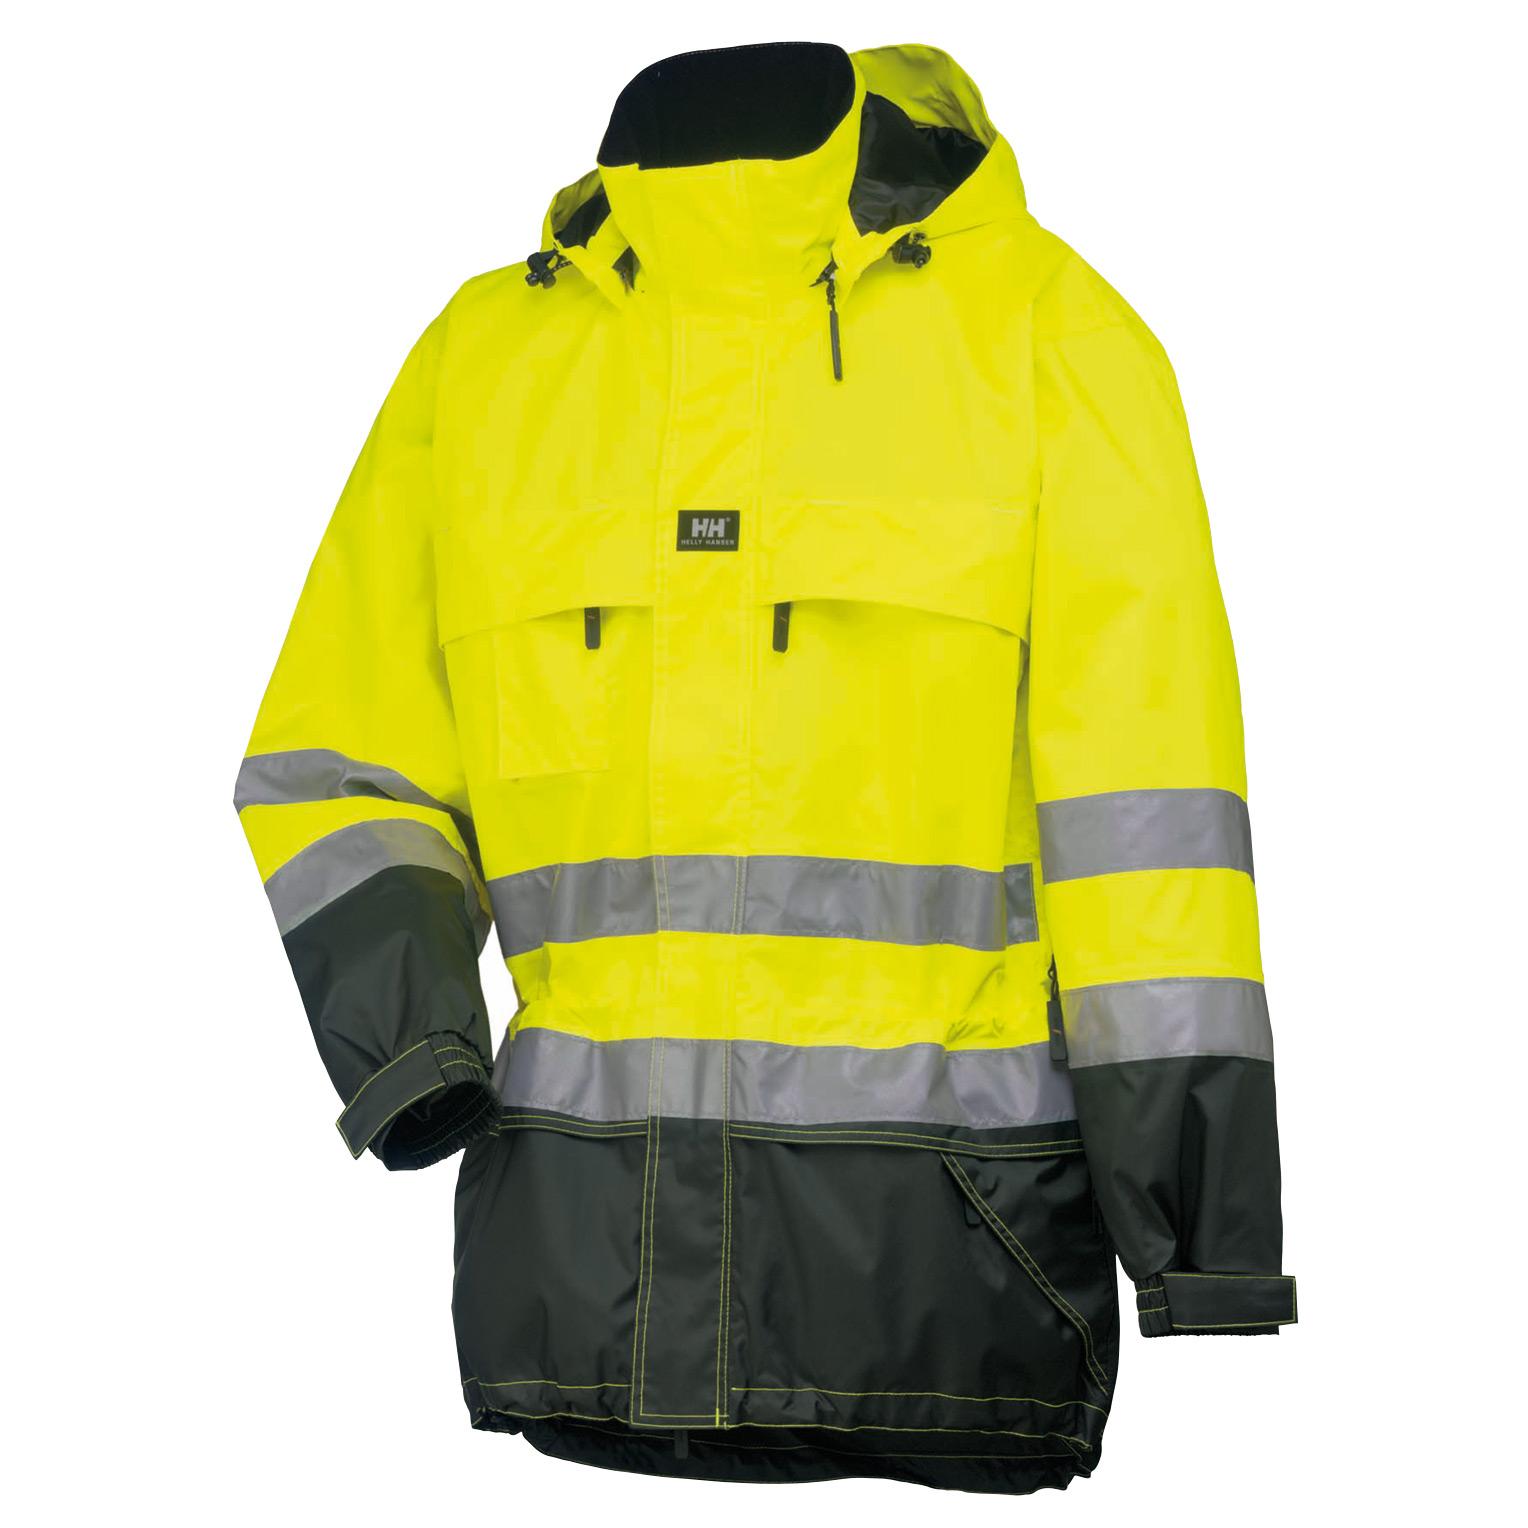 03ecf970fe1 Helly Hansen Potsdam High Visibility Winter Jacket — iWantWorkwear